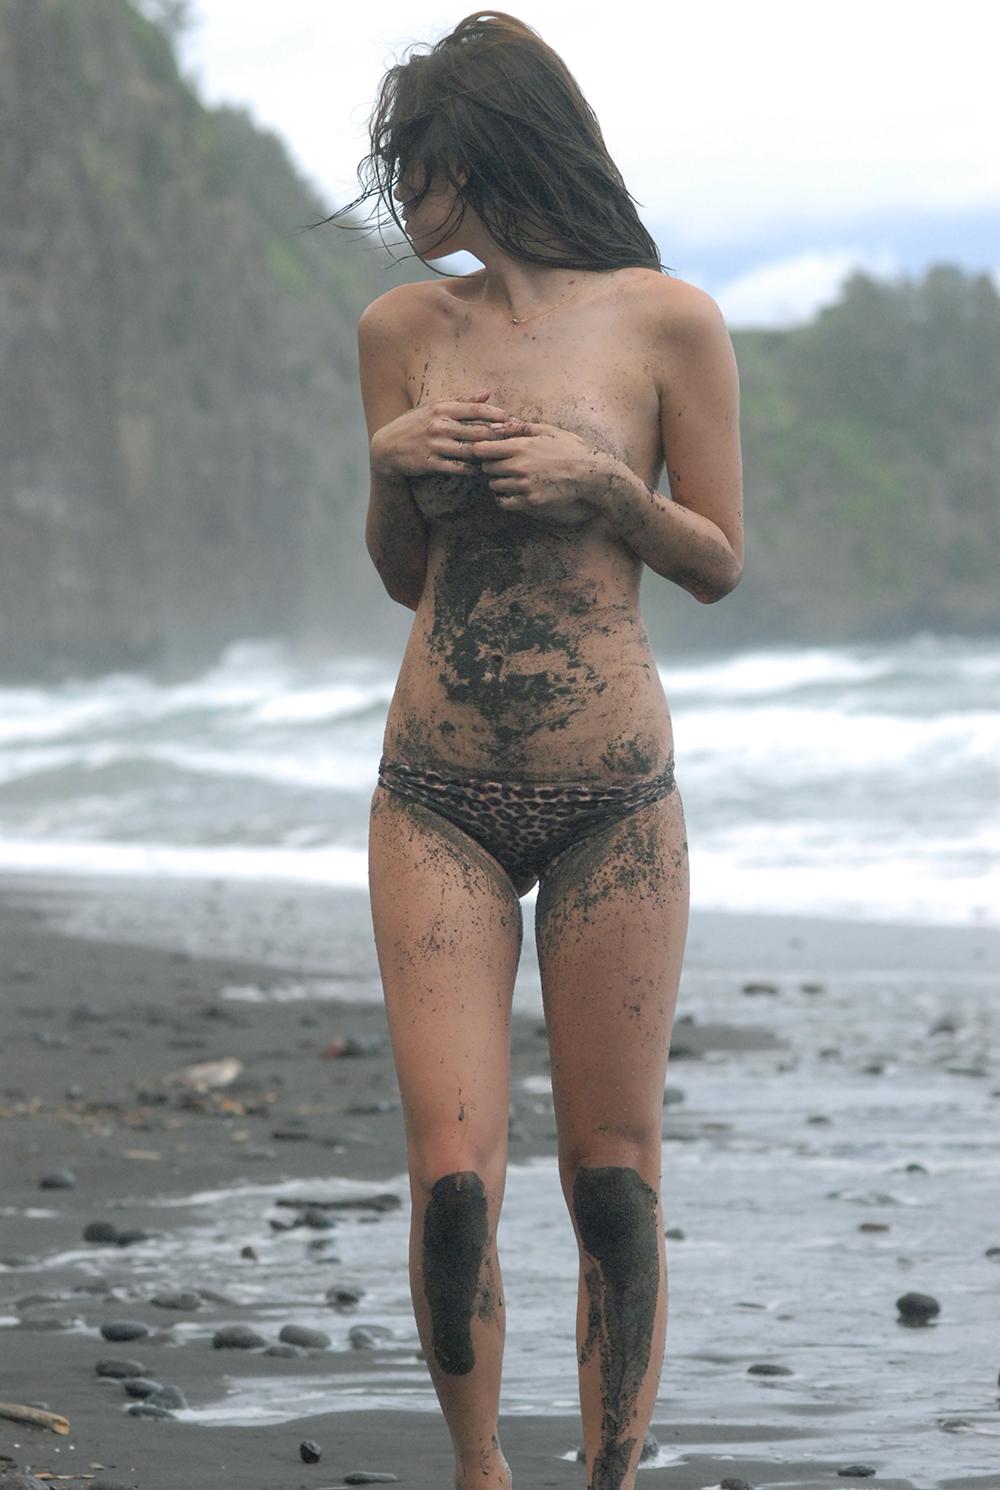 Swimbook_swimsuit_Acacia_Marlie_Hinshaw_DSC_0648.JPG